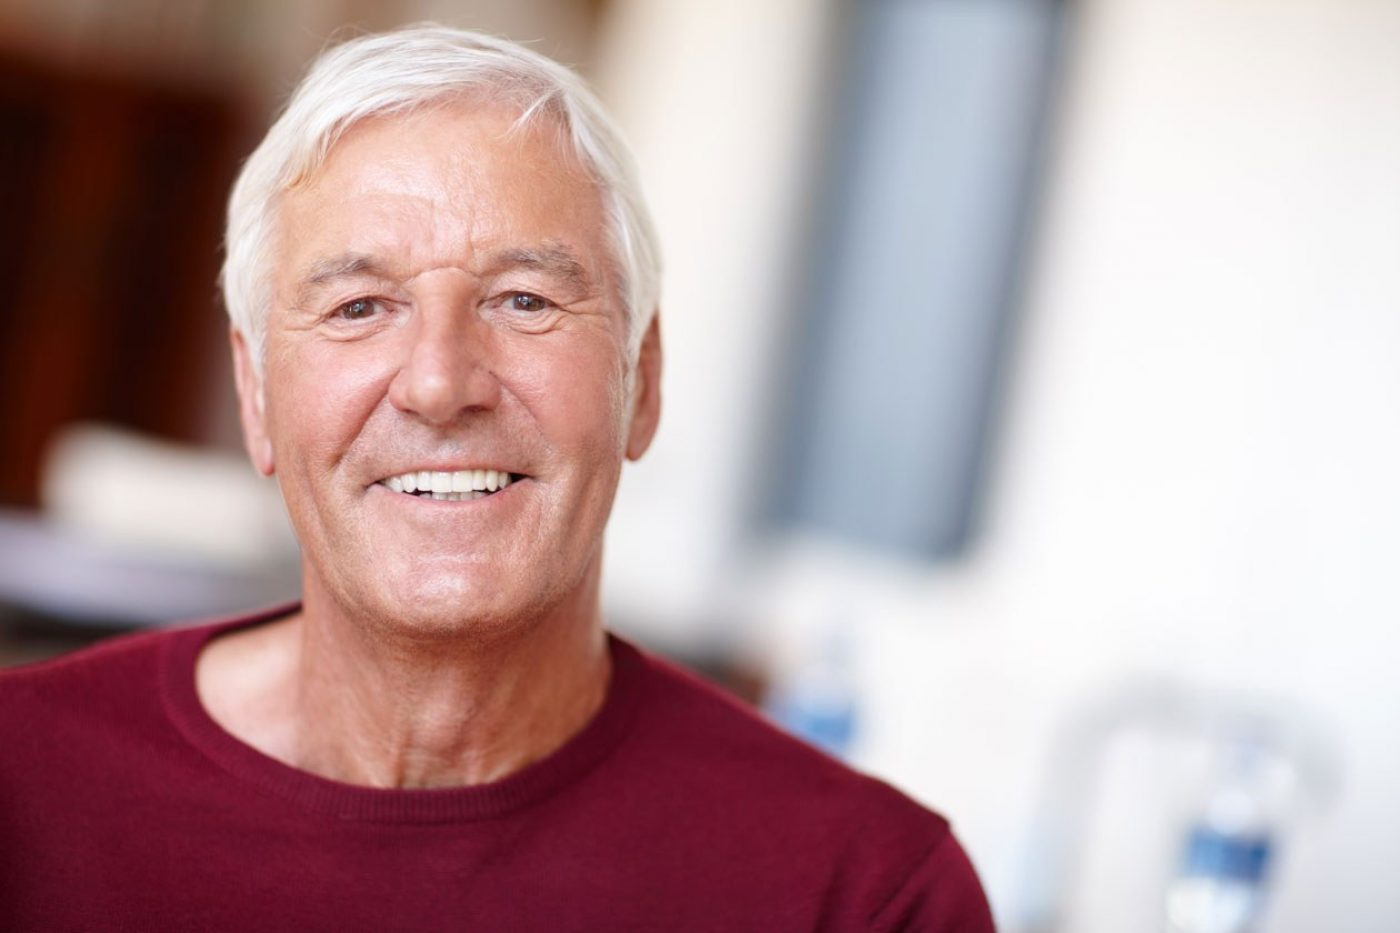 Hdic Dental Implants Implantsecureddentures